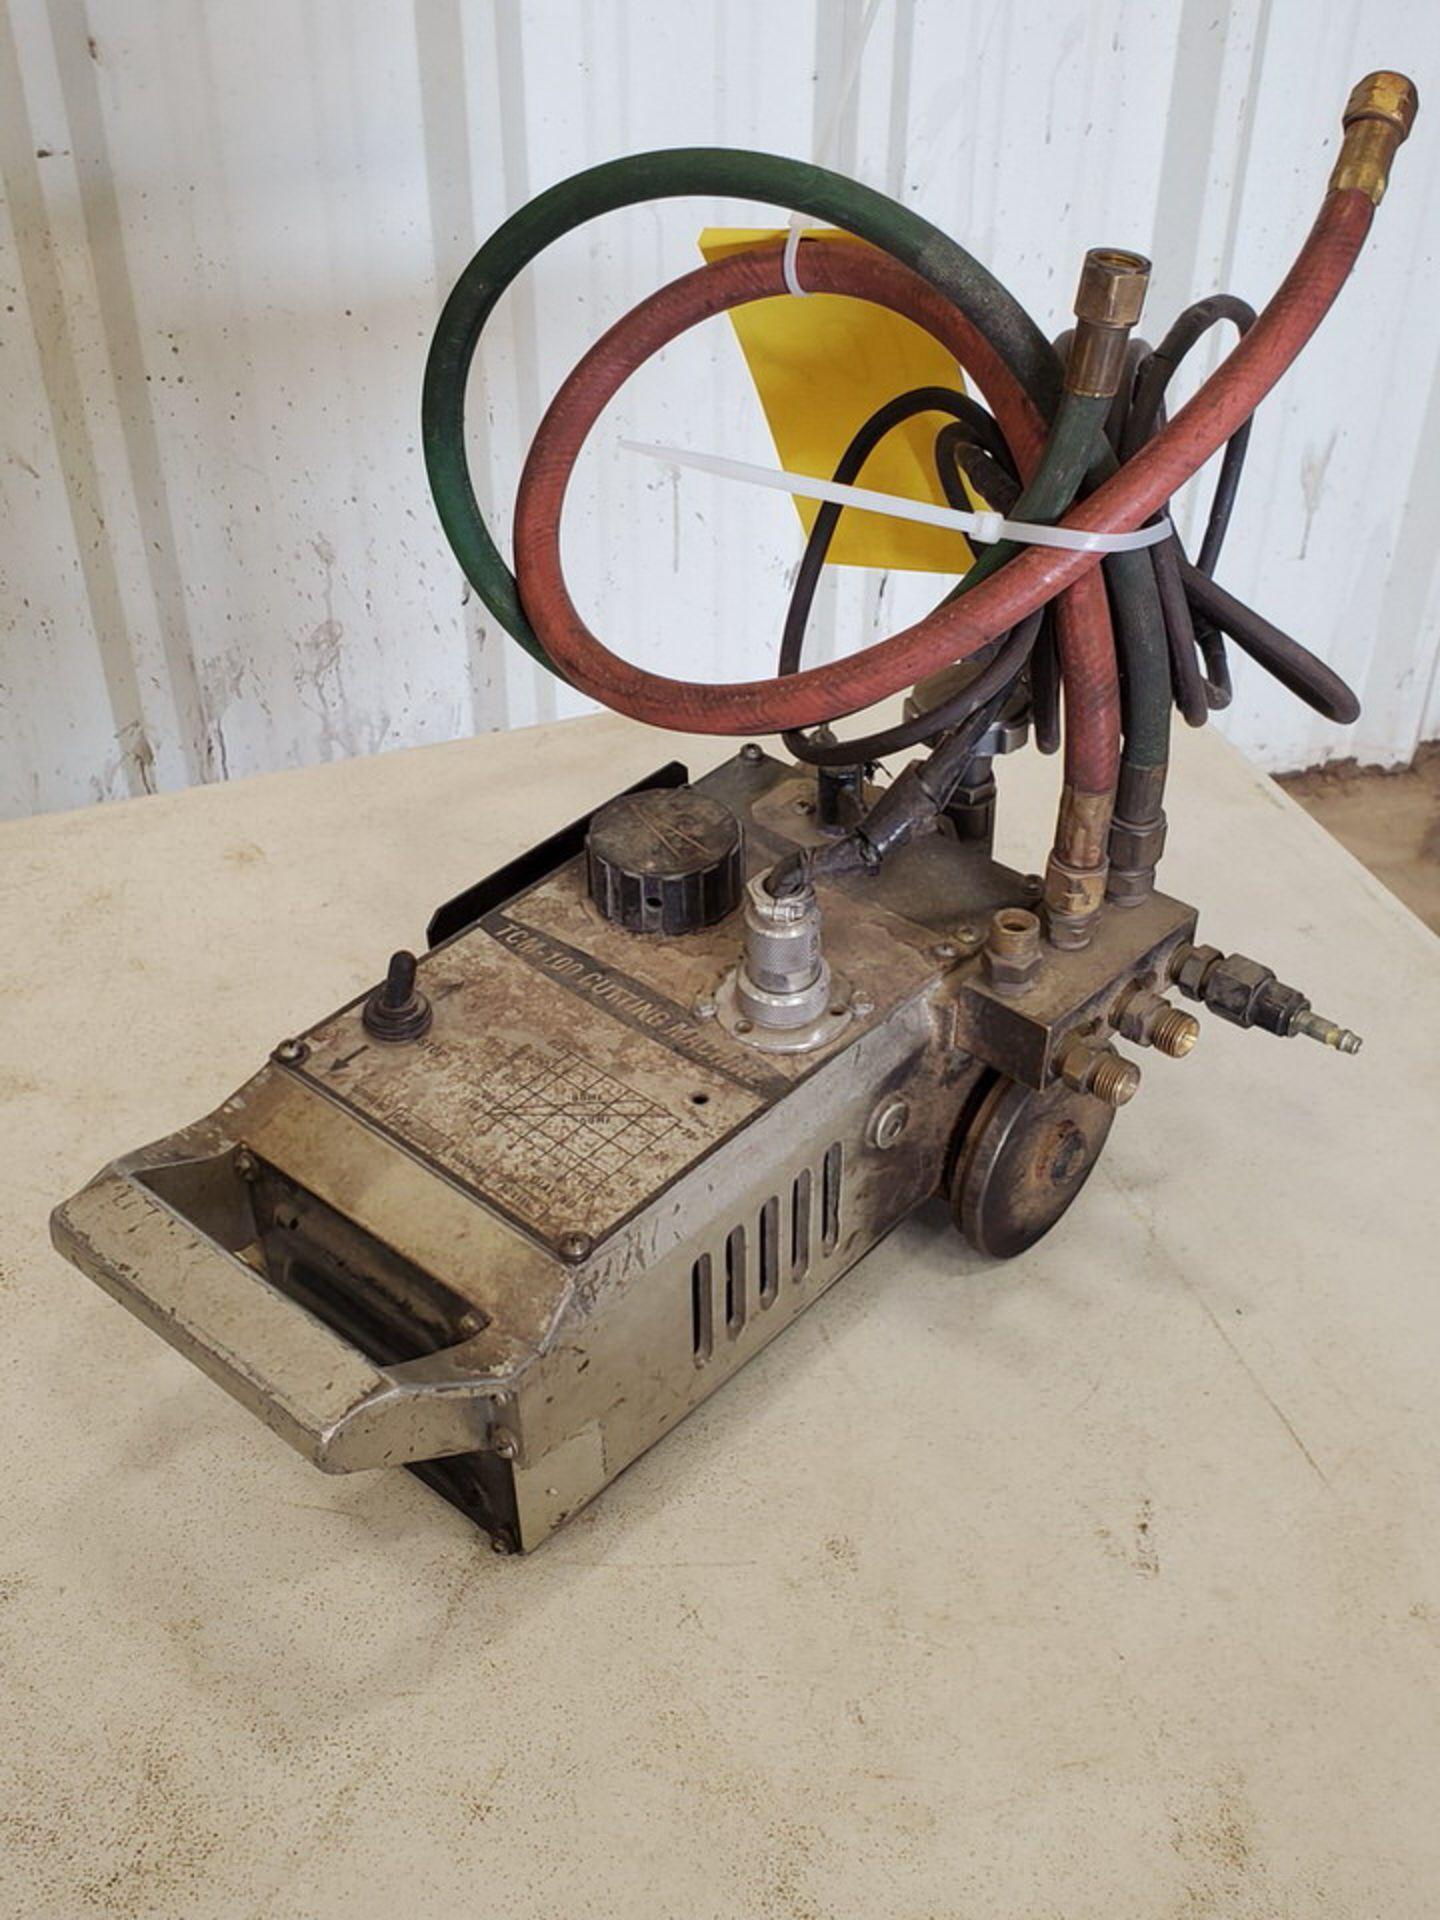 Profax Portable Track Cutting Machine 115V - Image 2 of 5